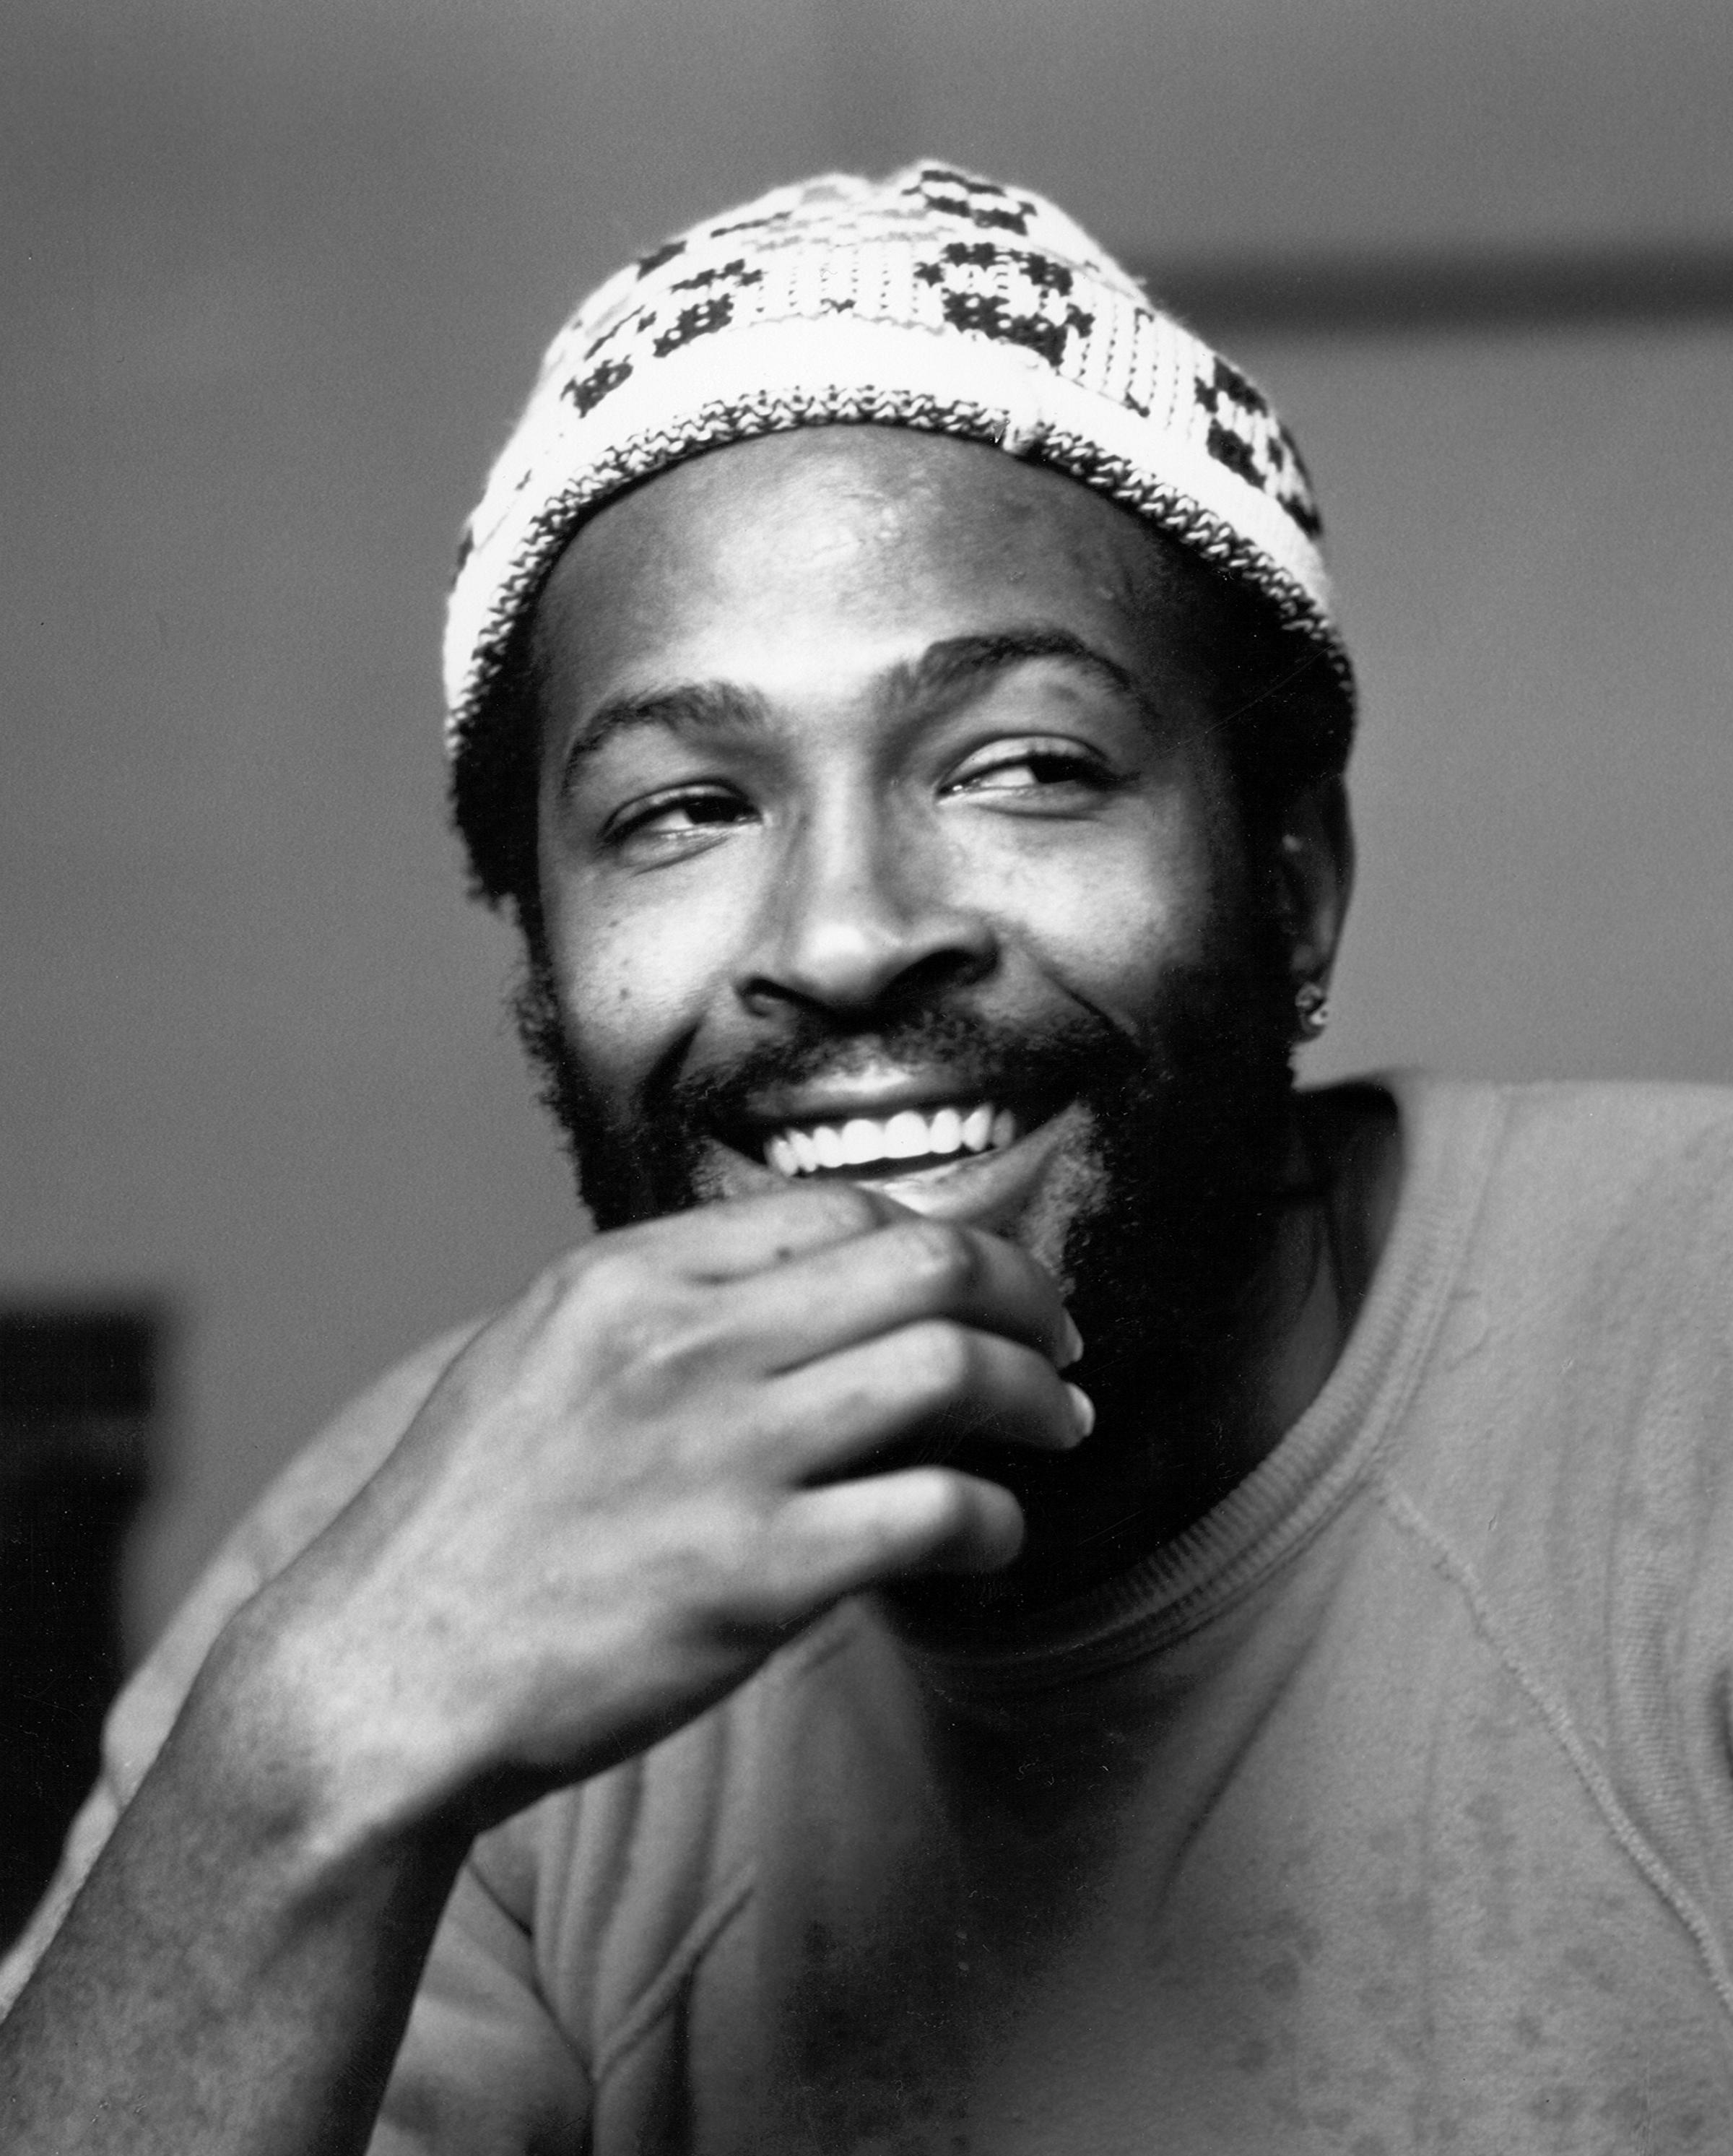 Marvin Gaye Portrait Wearing White Cap